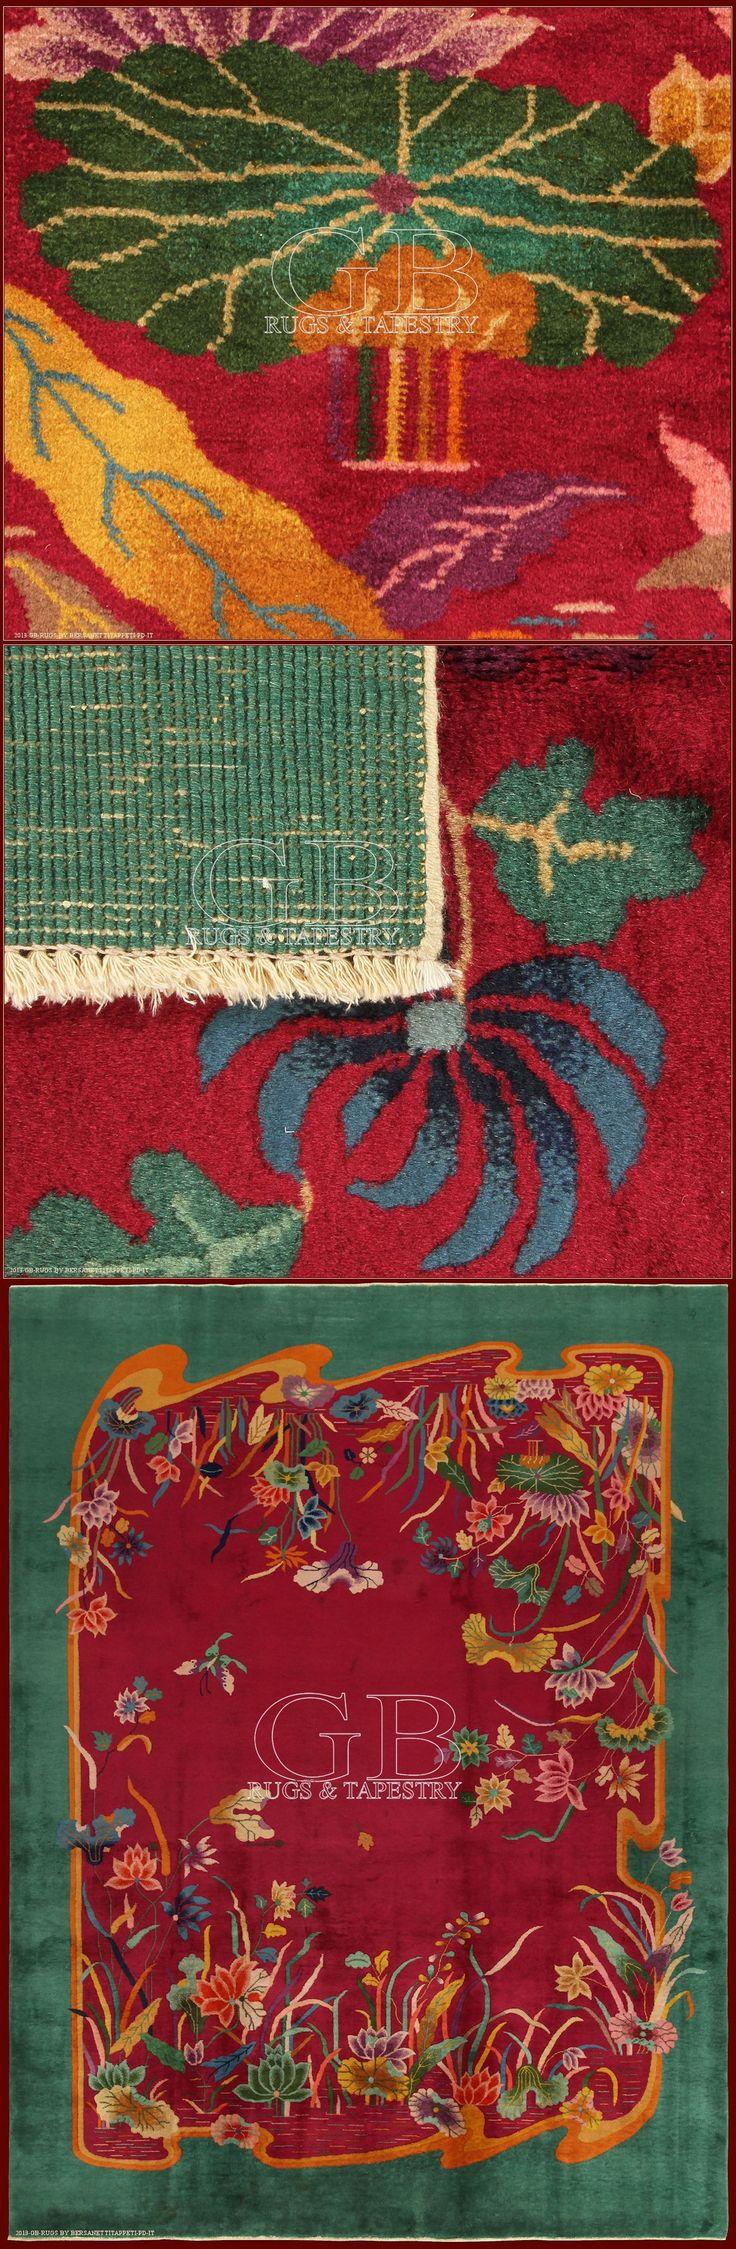 Peching Vintage Carpetcm 353 x 270ft 11'6 x 8'9 Cod:: 141403143915Origin: ChinaAge: Old